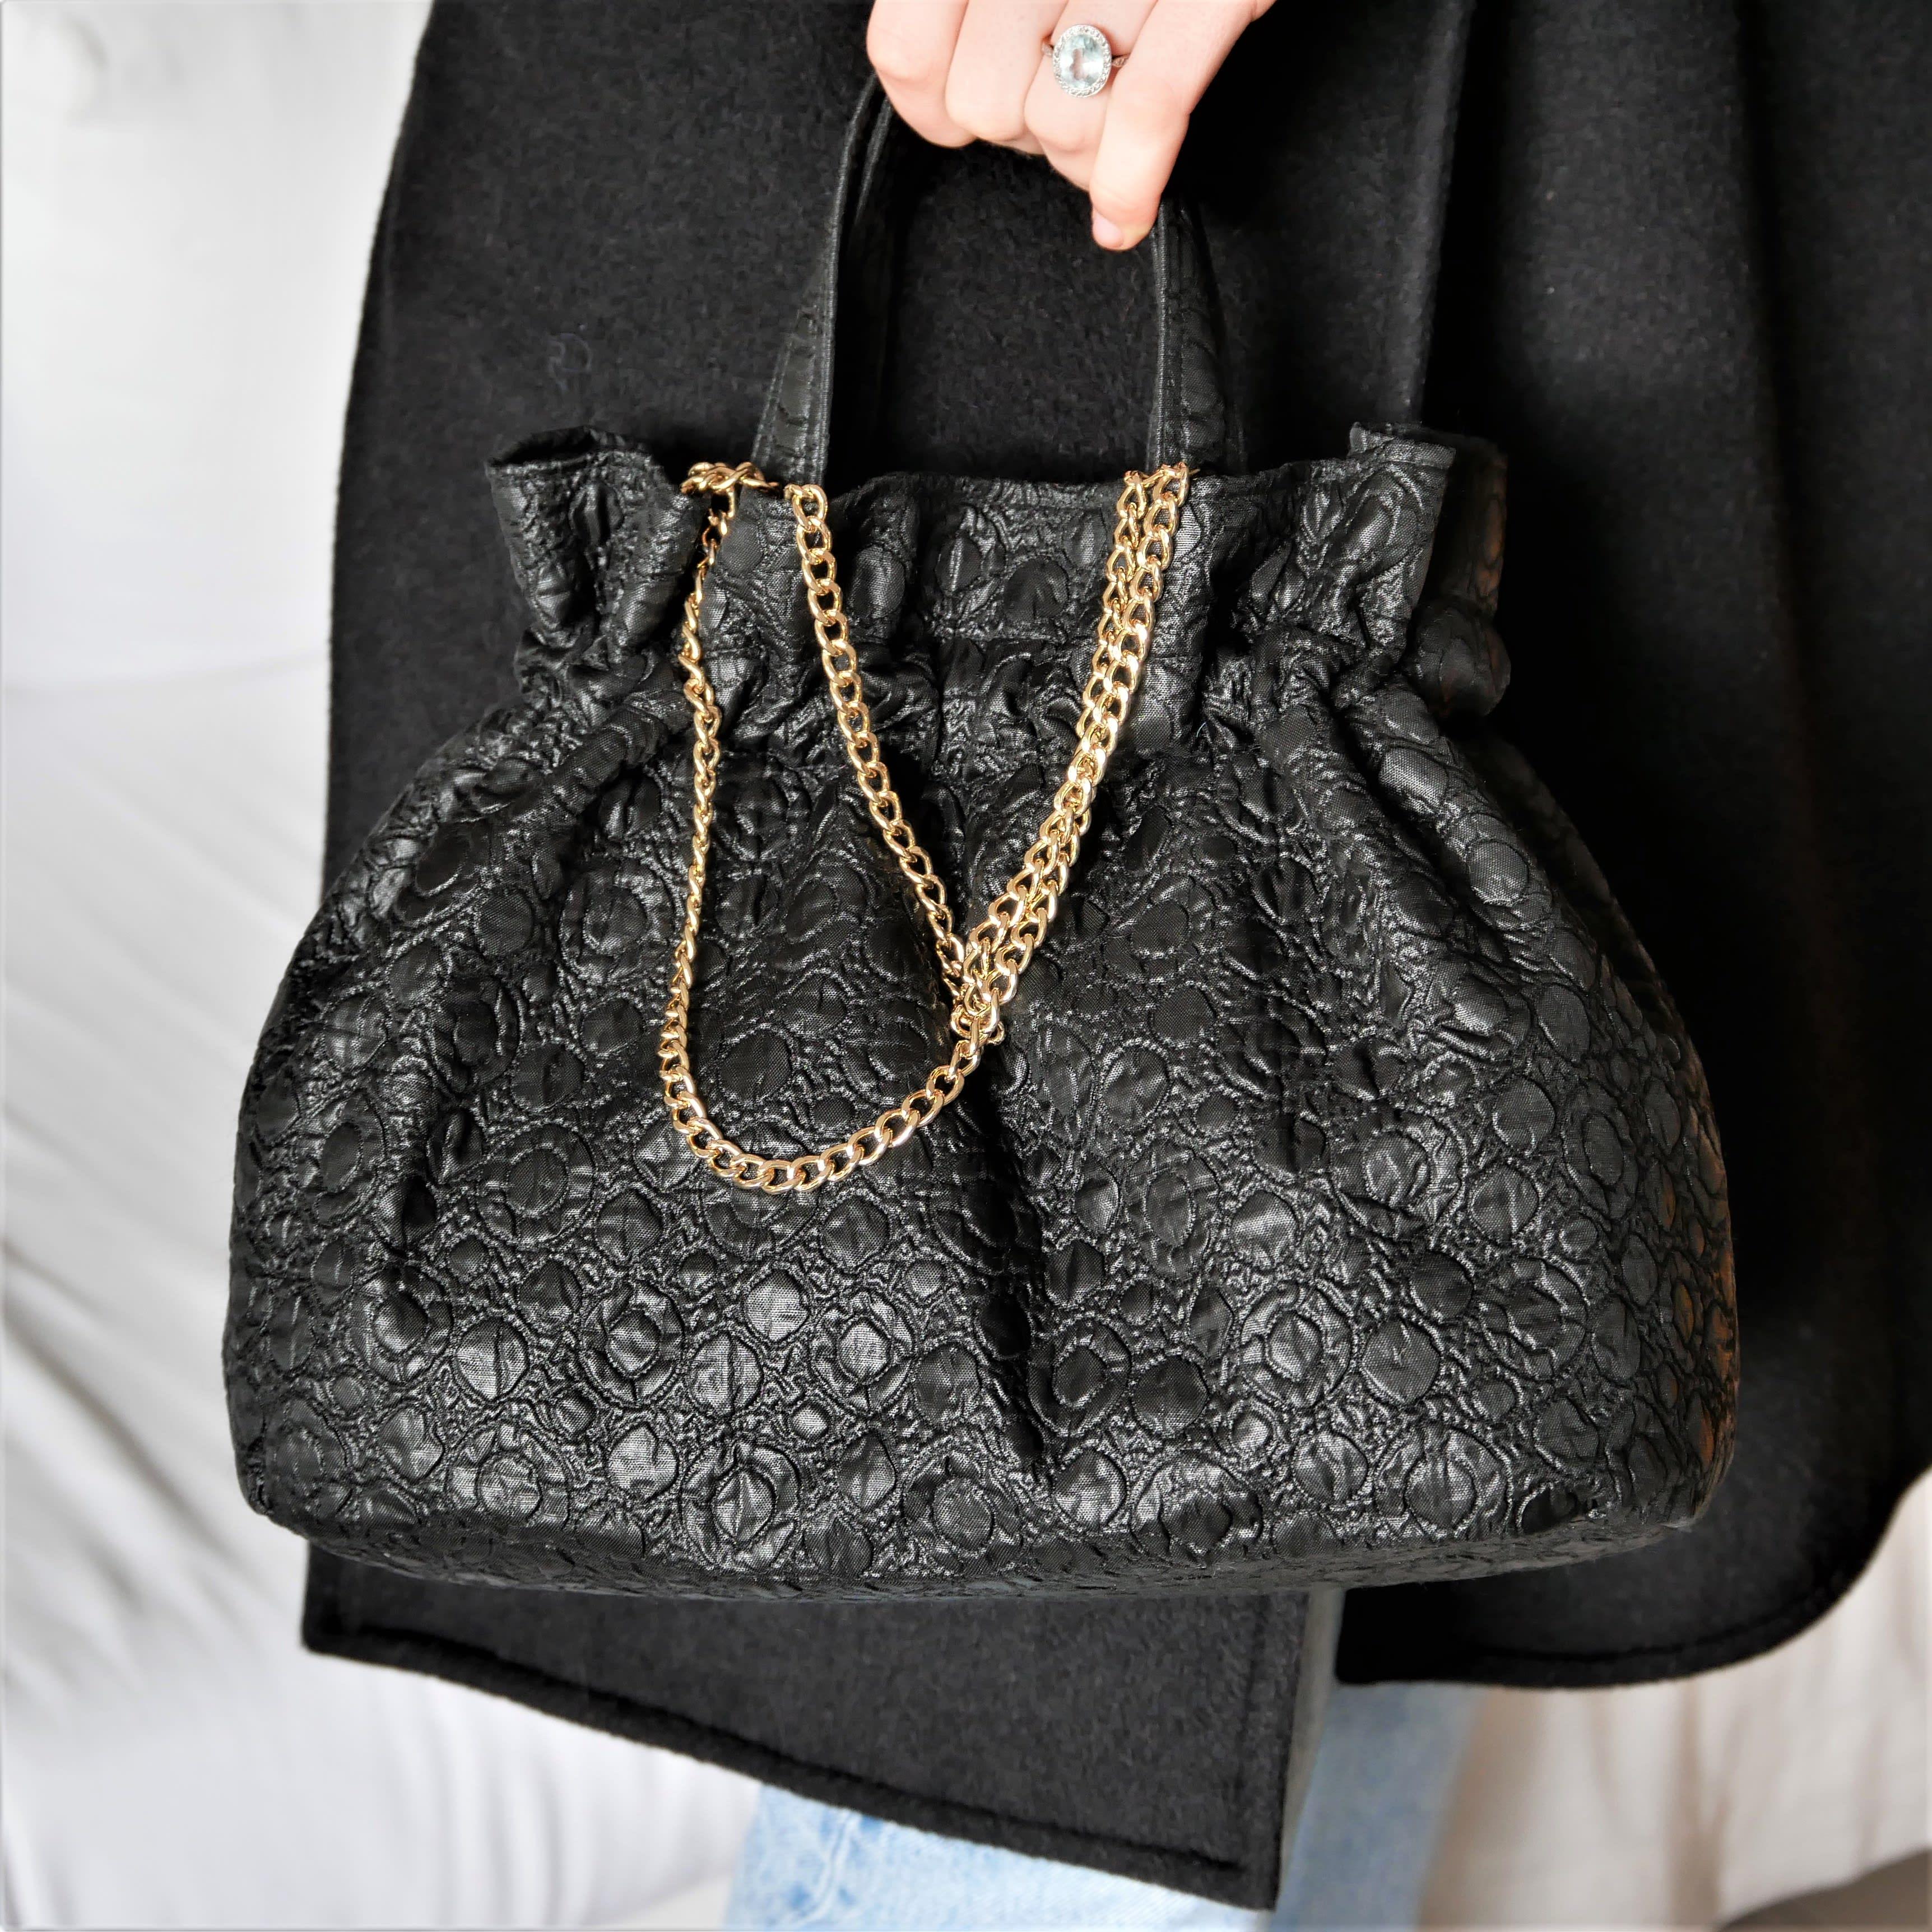 Fifties original black purse. Vintage fabric bag with removable chain. Washable, handmade.